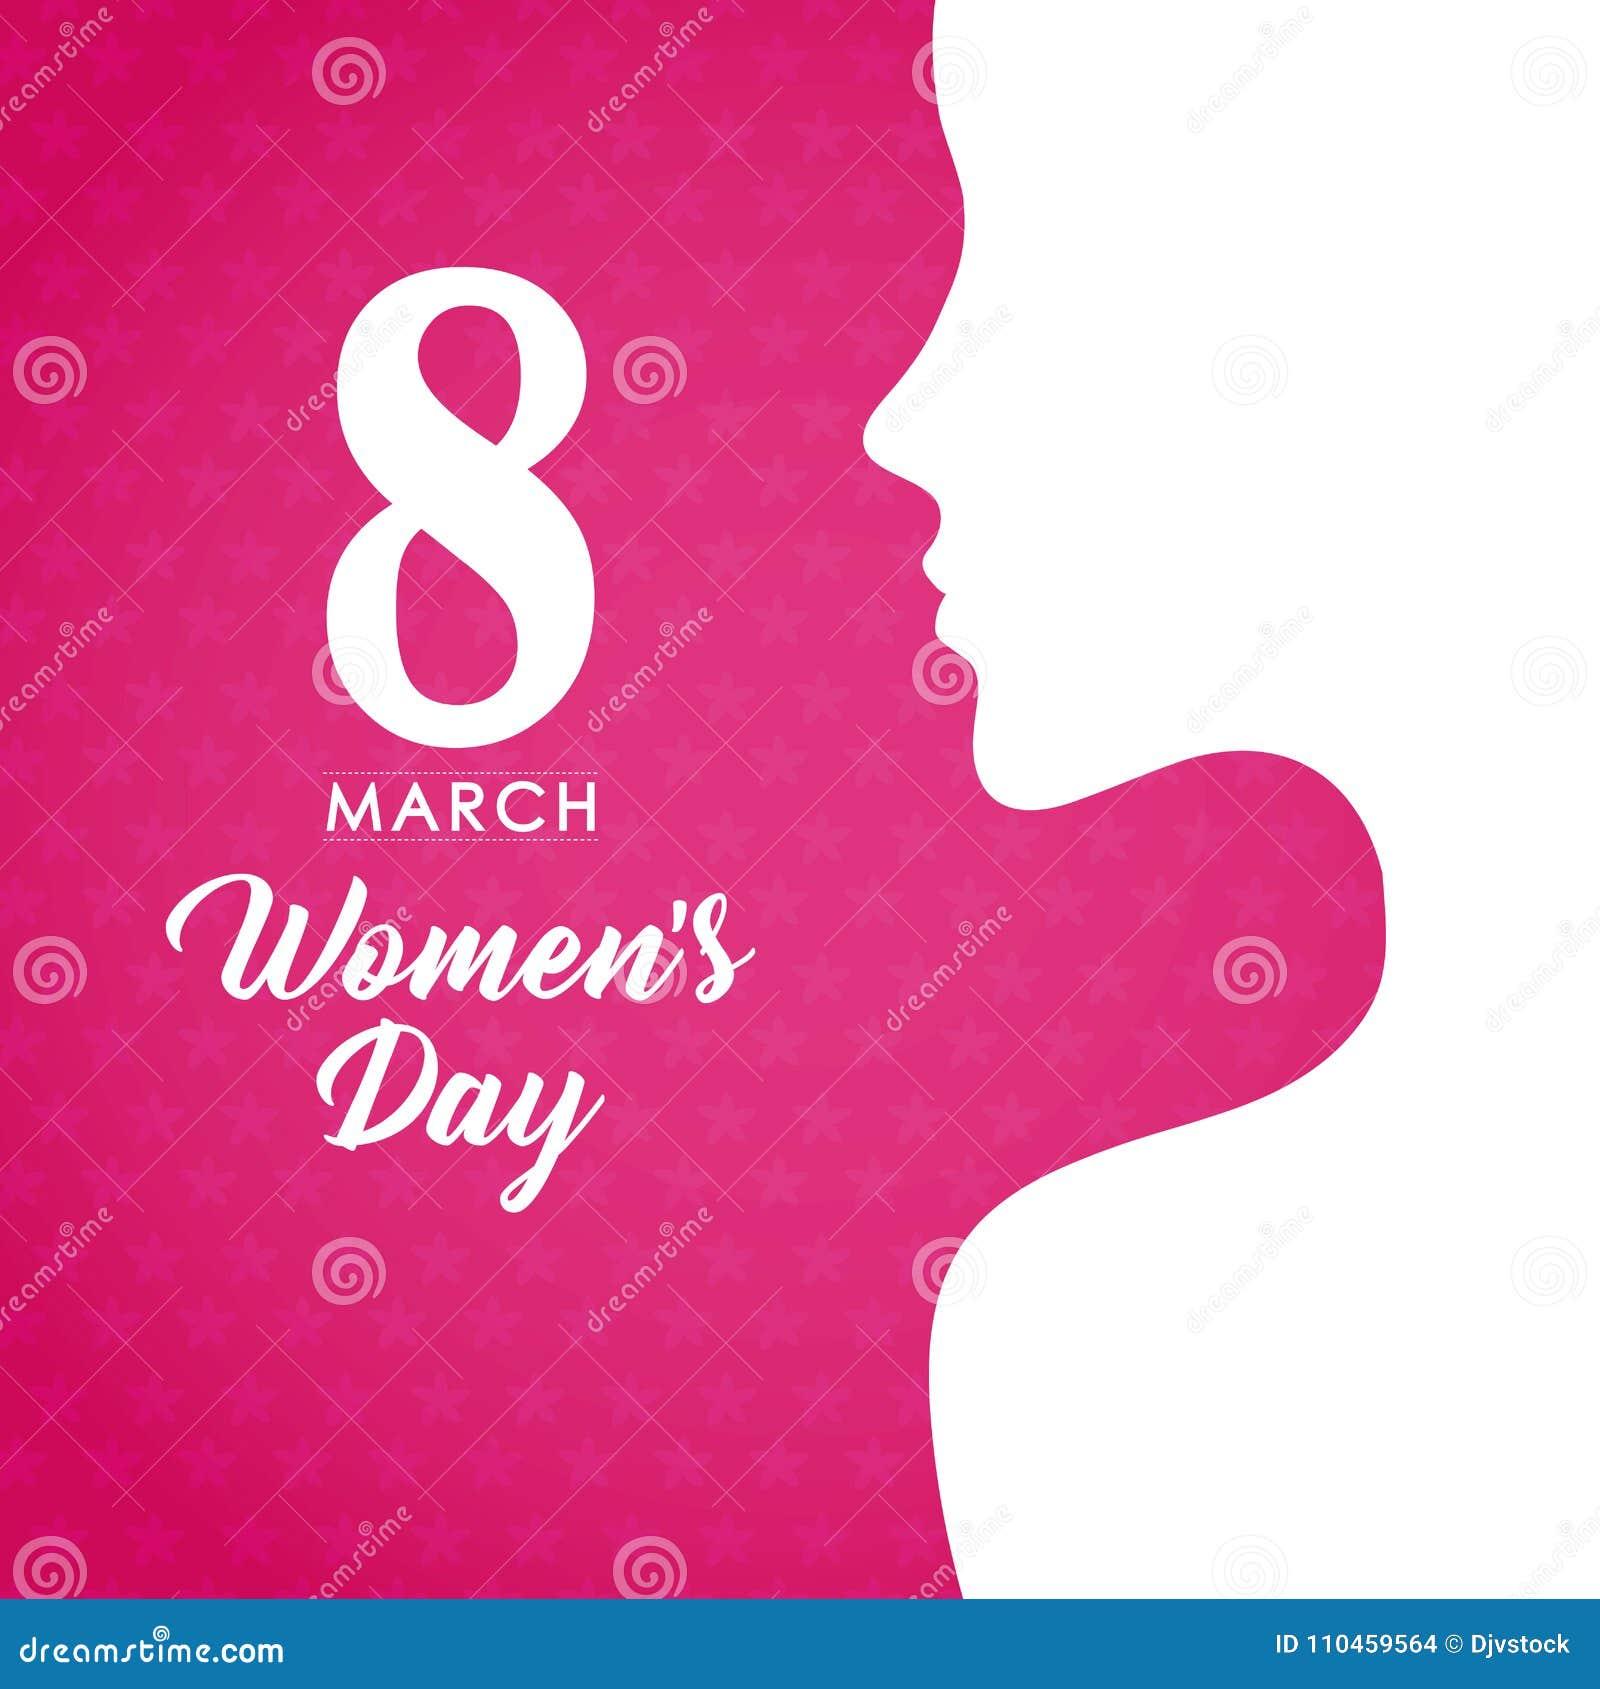 Kvinnors dagdesign